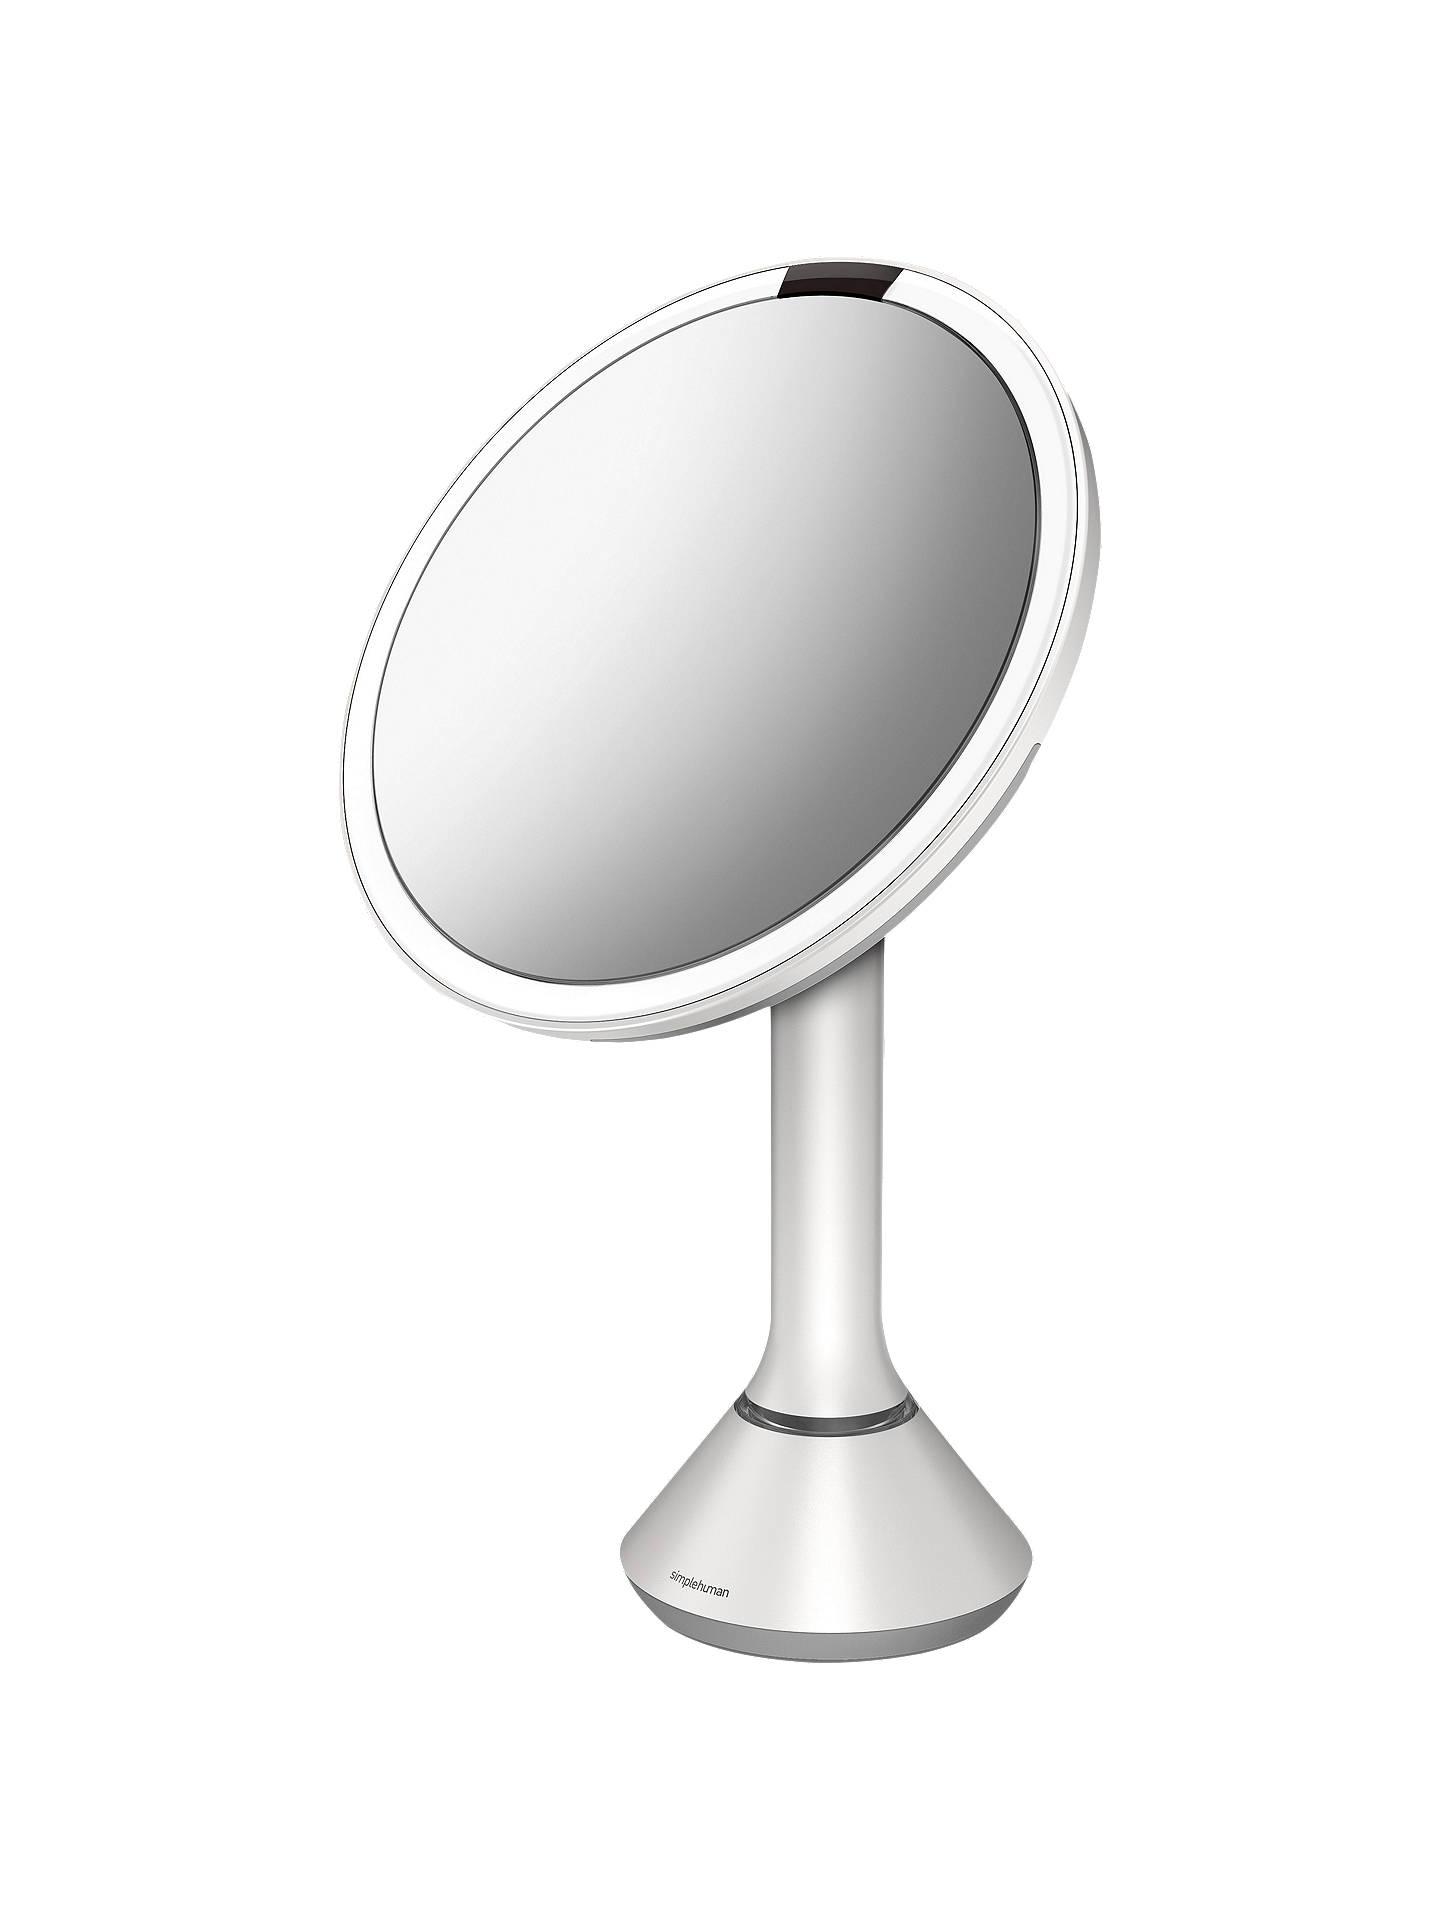 Simplehuman Sensor Illuminated Magnifying Bathroom Mirror